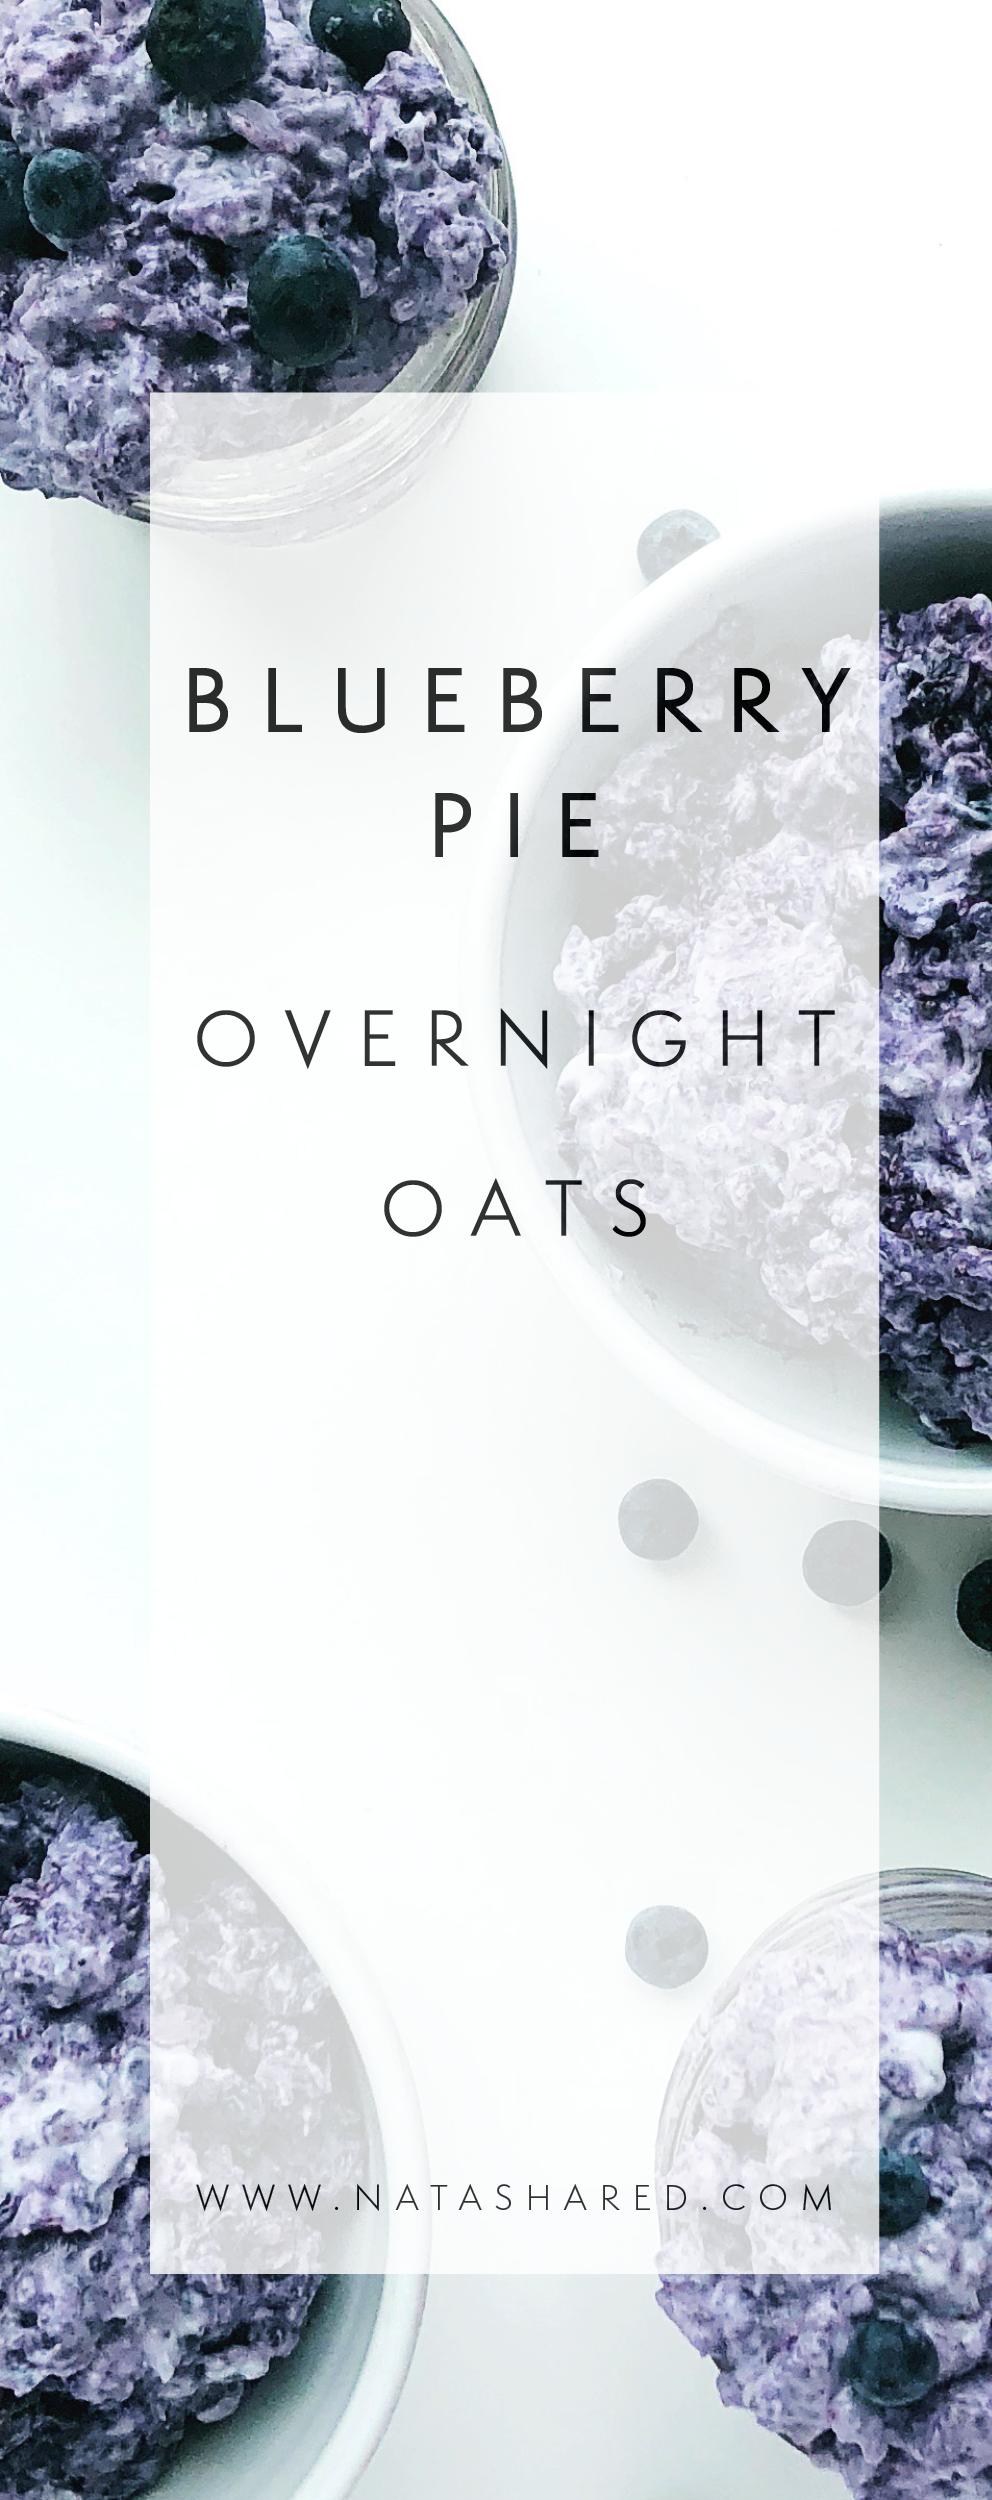 Blueberry Pie Overnight Oats | Overnight Oats Club